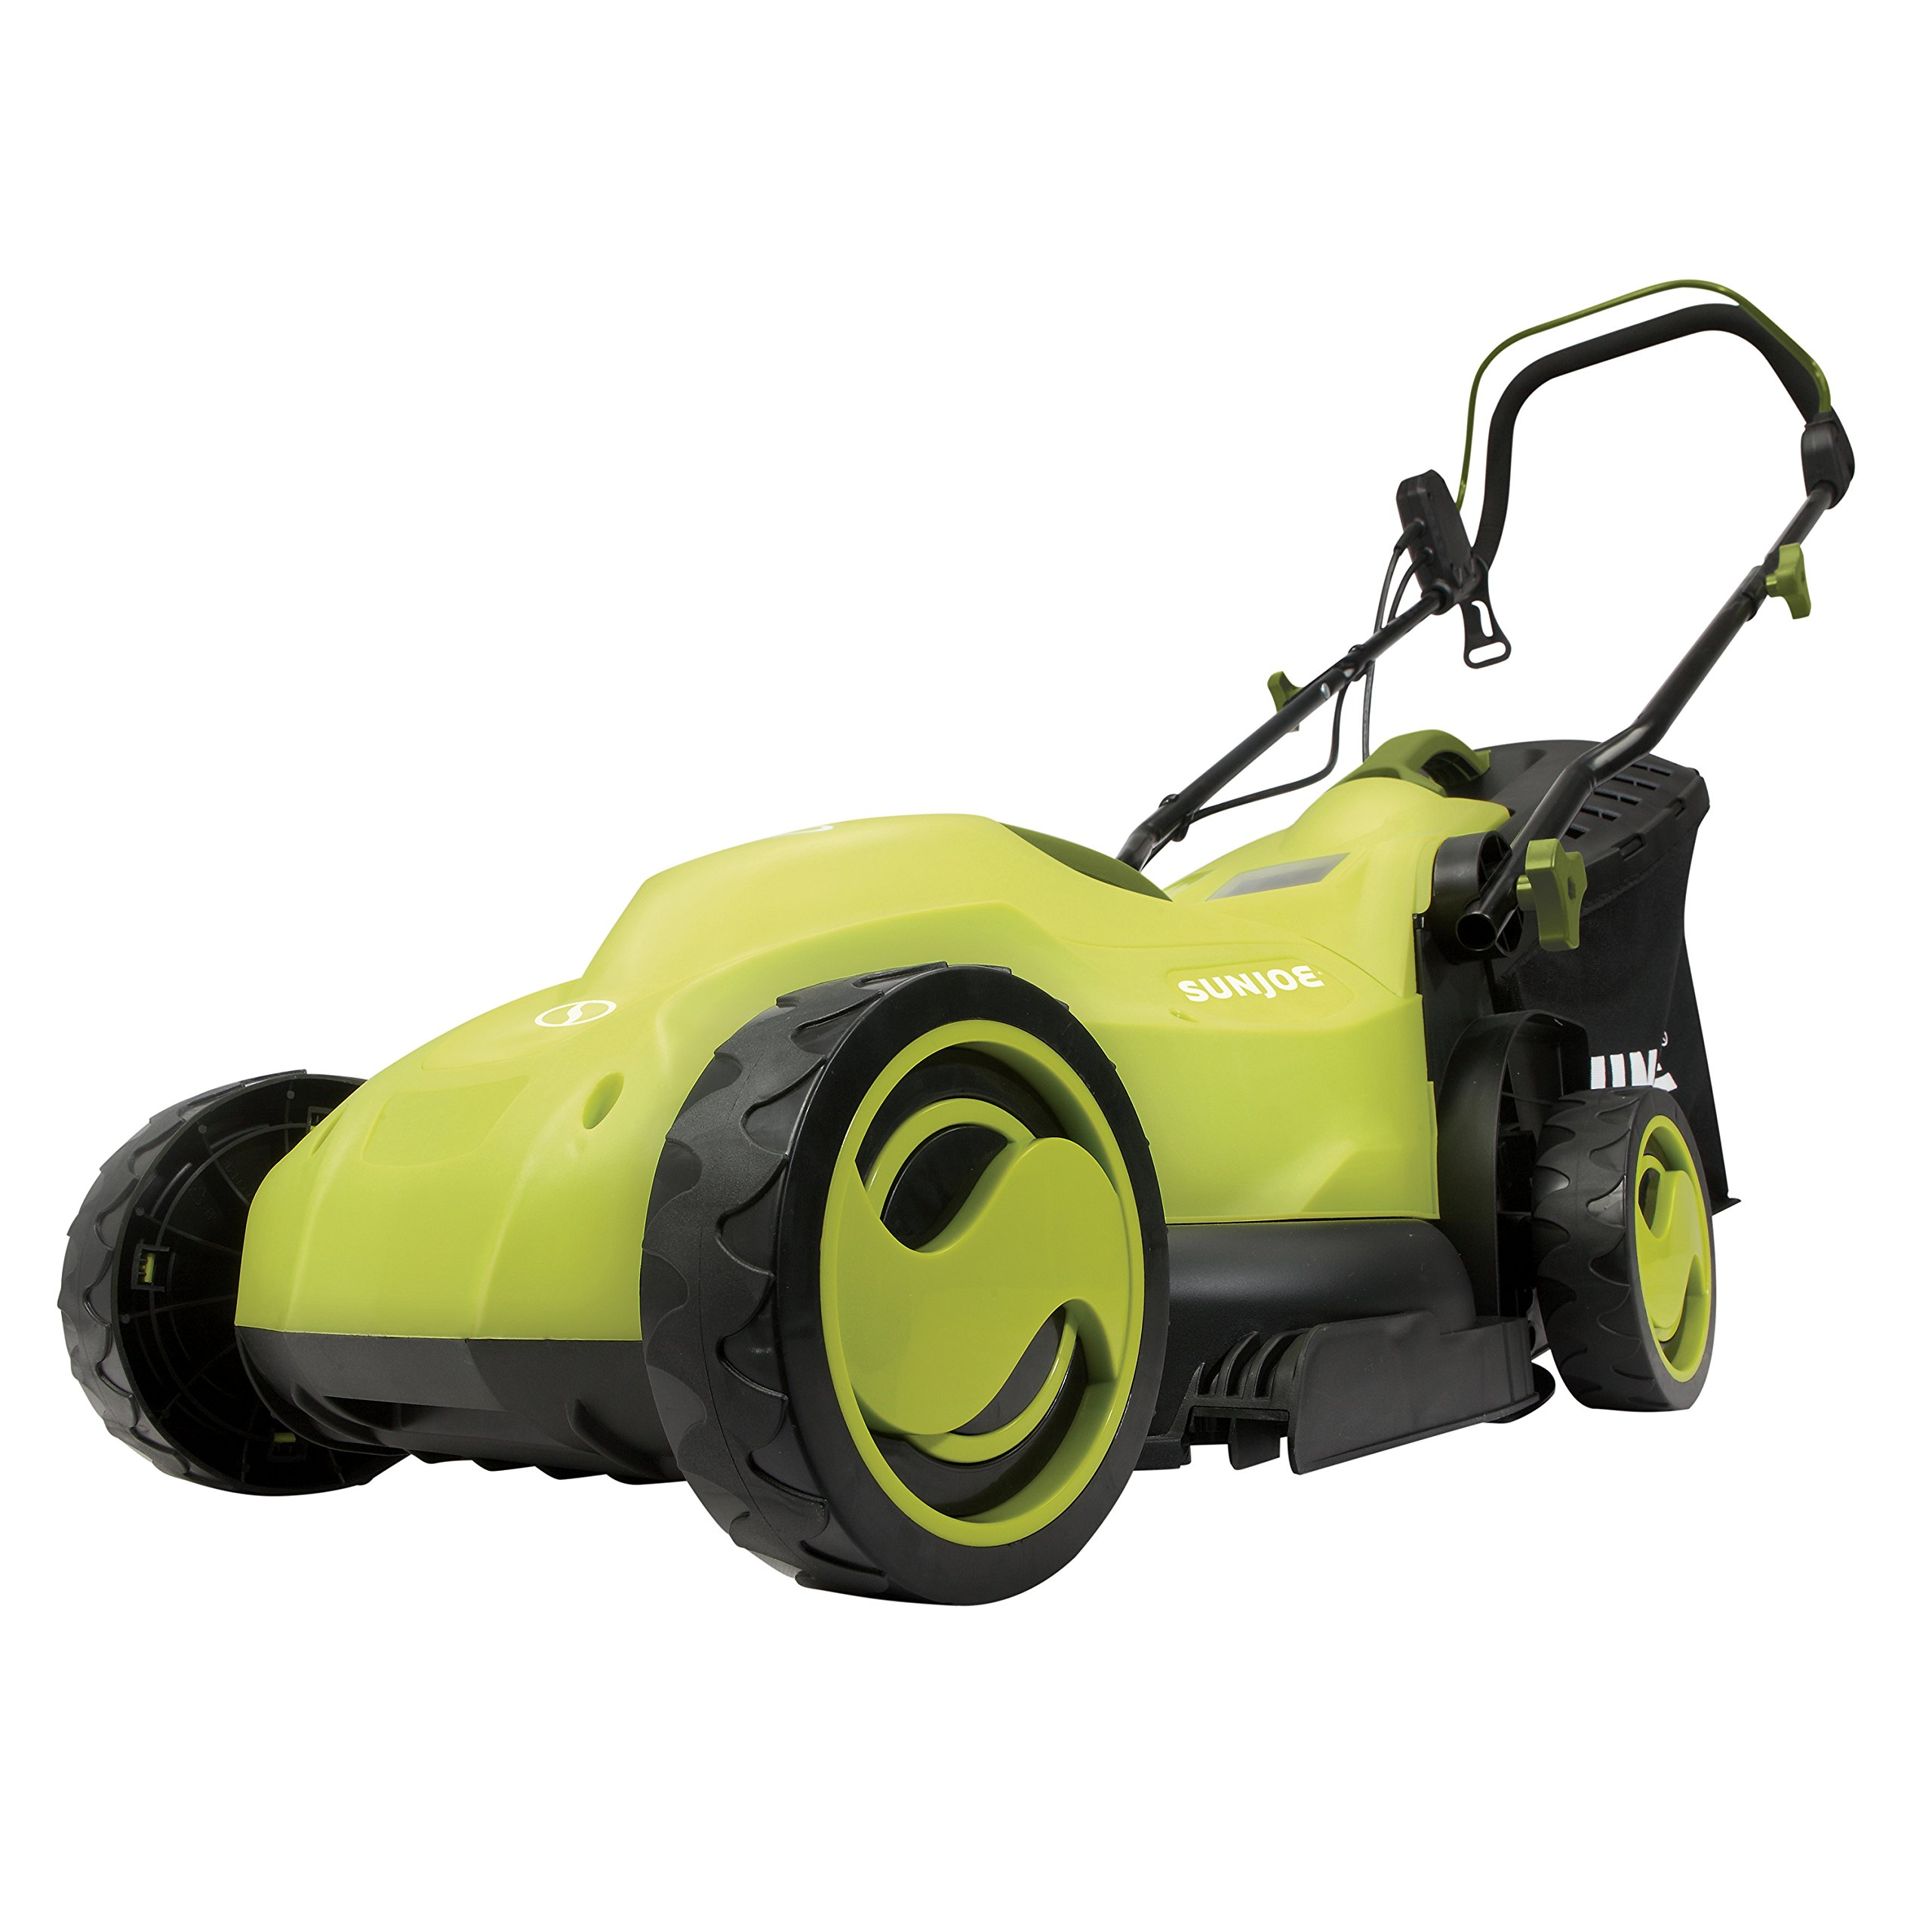 Sun Joe MJ400E 12-Amp 13-Inch Electric Lawn Mower w/ Grass Collection Bag by Sun Joe